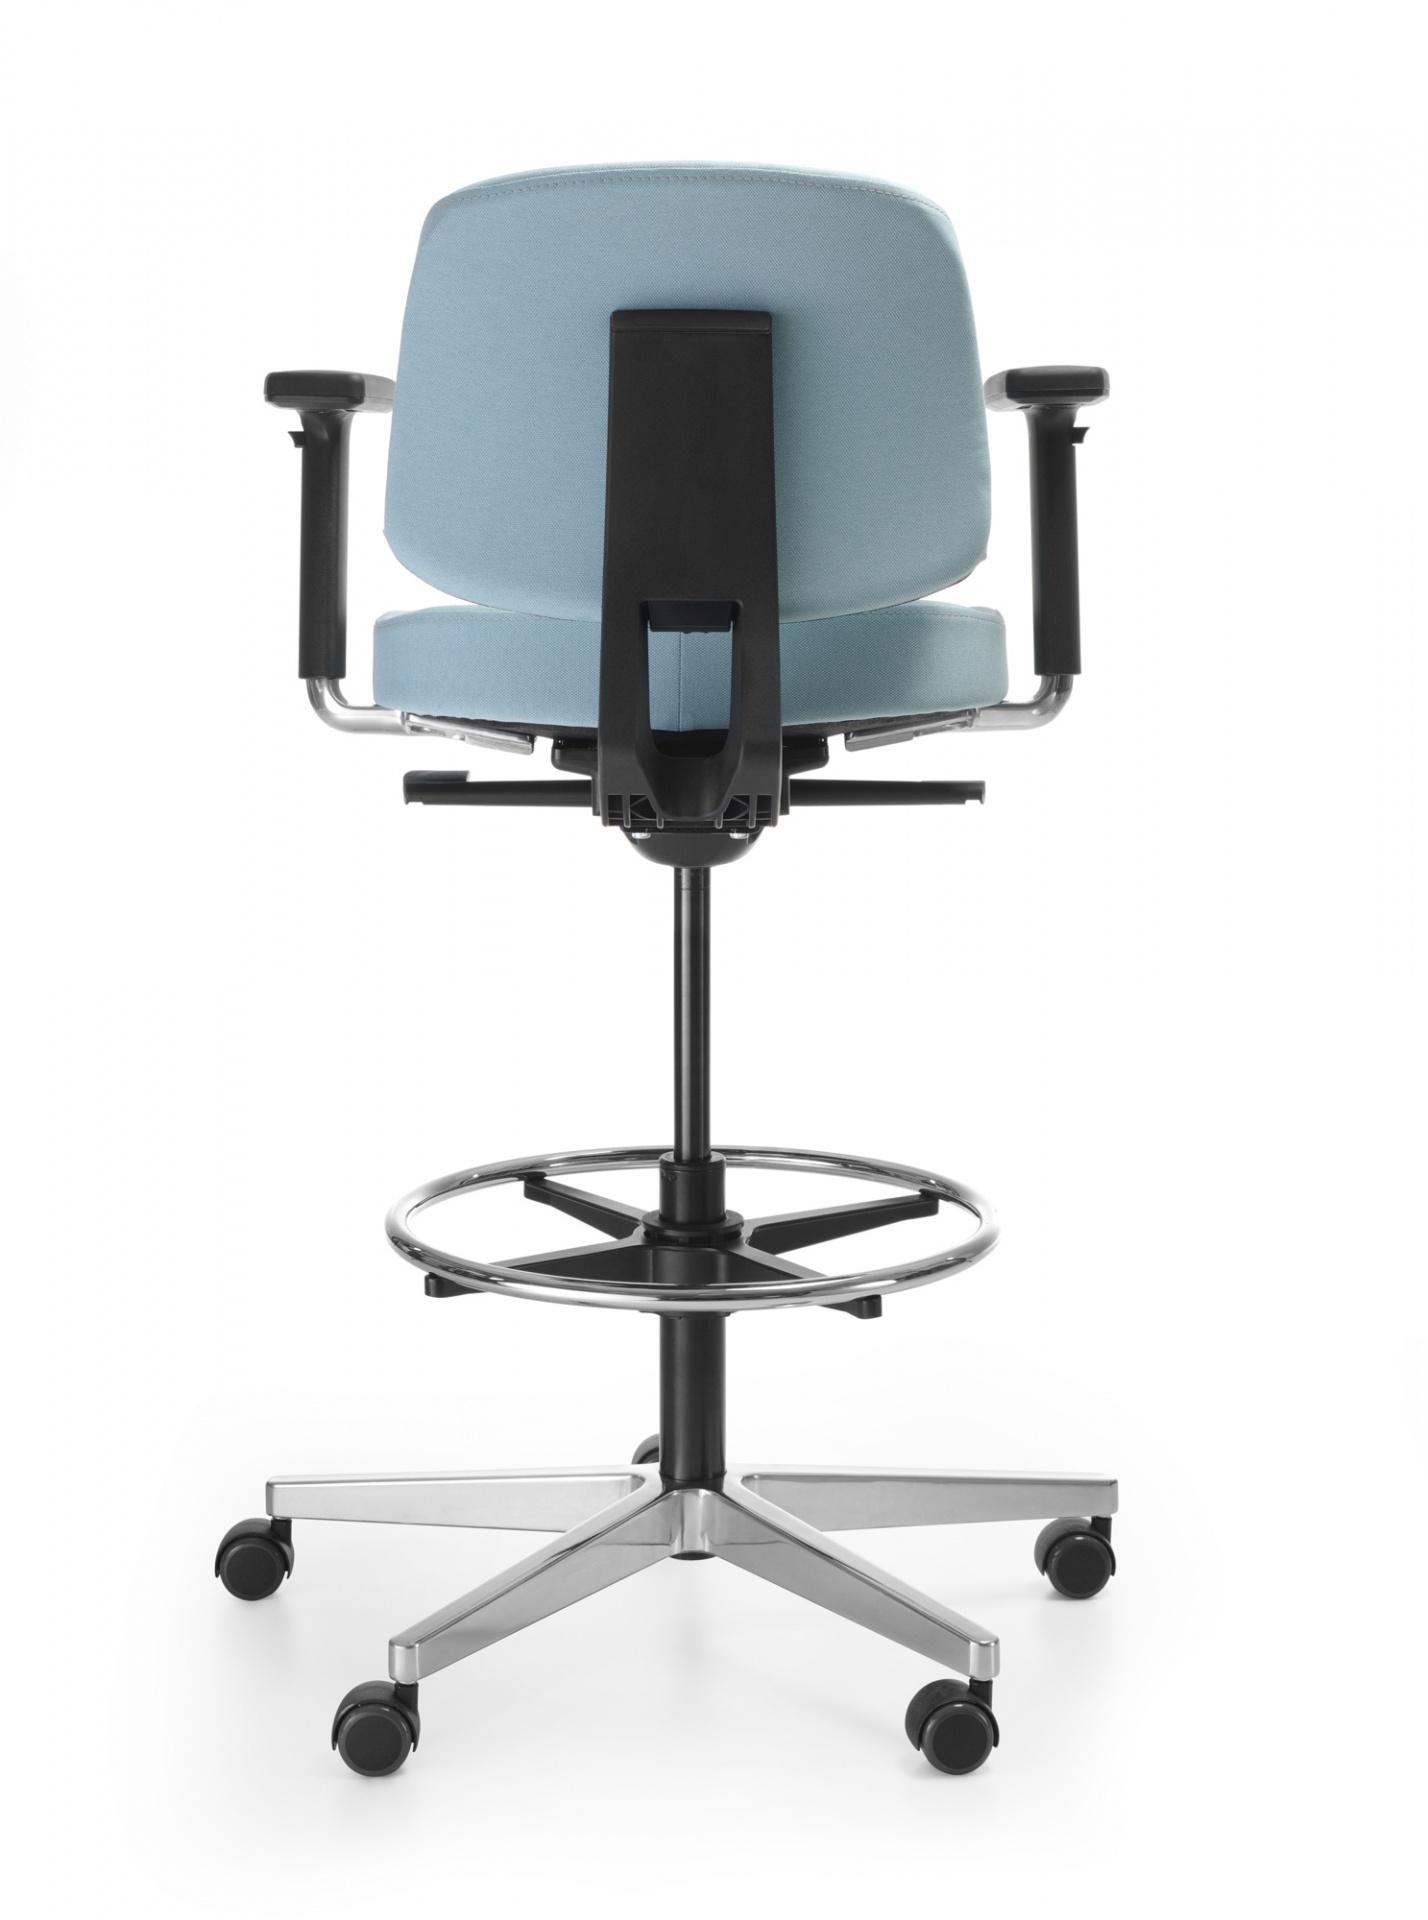 Lift aktīvs stāvkrēsls